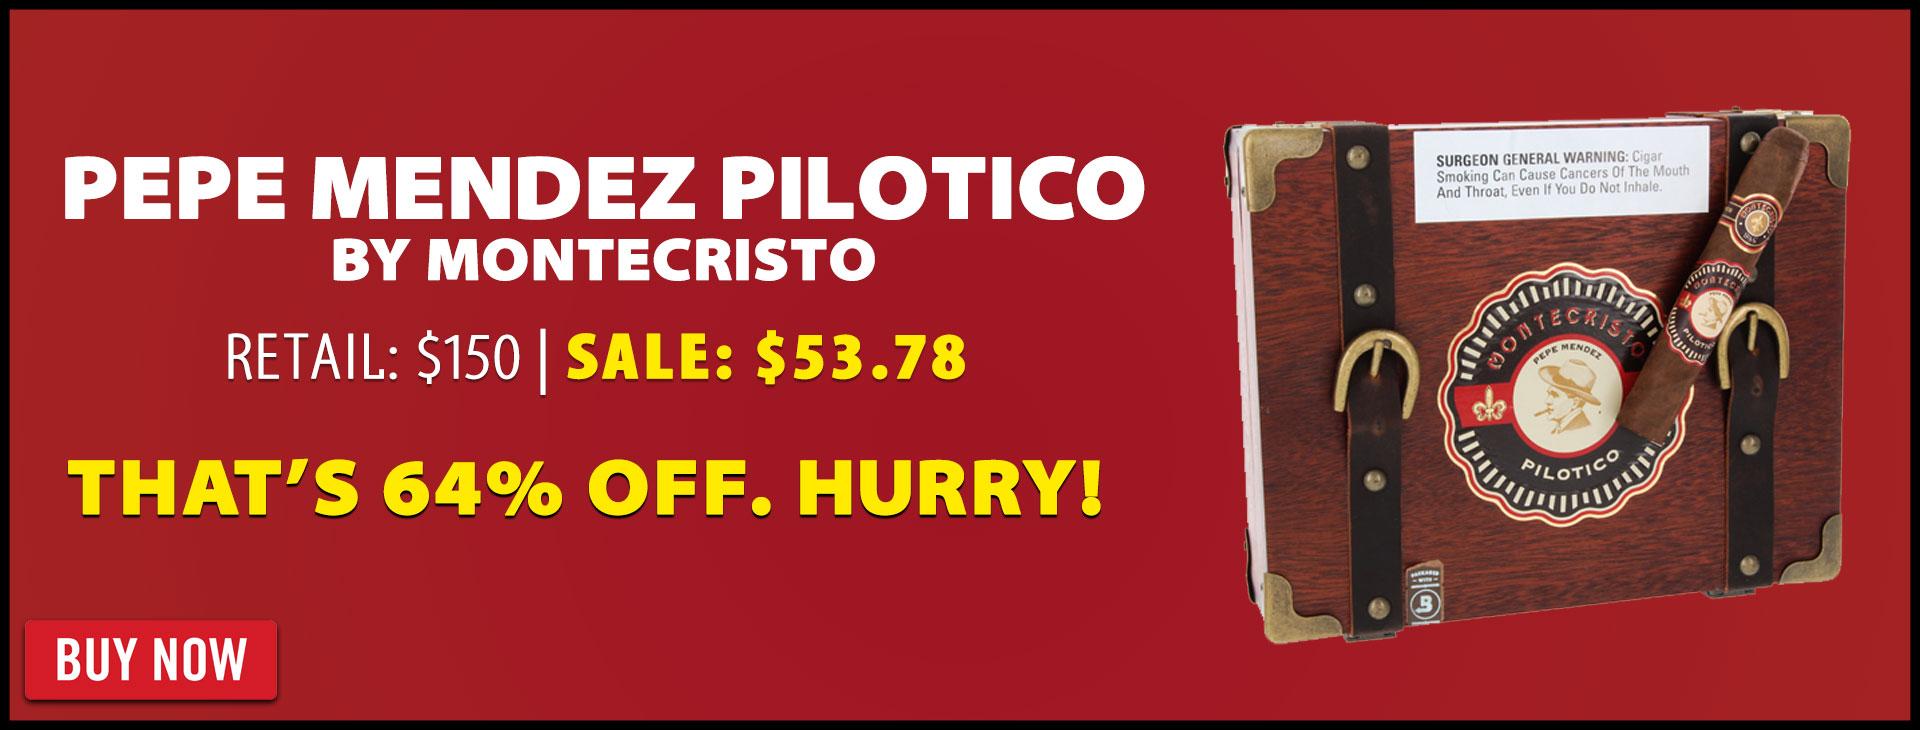 montecristo-pilotico-pepe-mendez-2020-banner.jpg